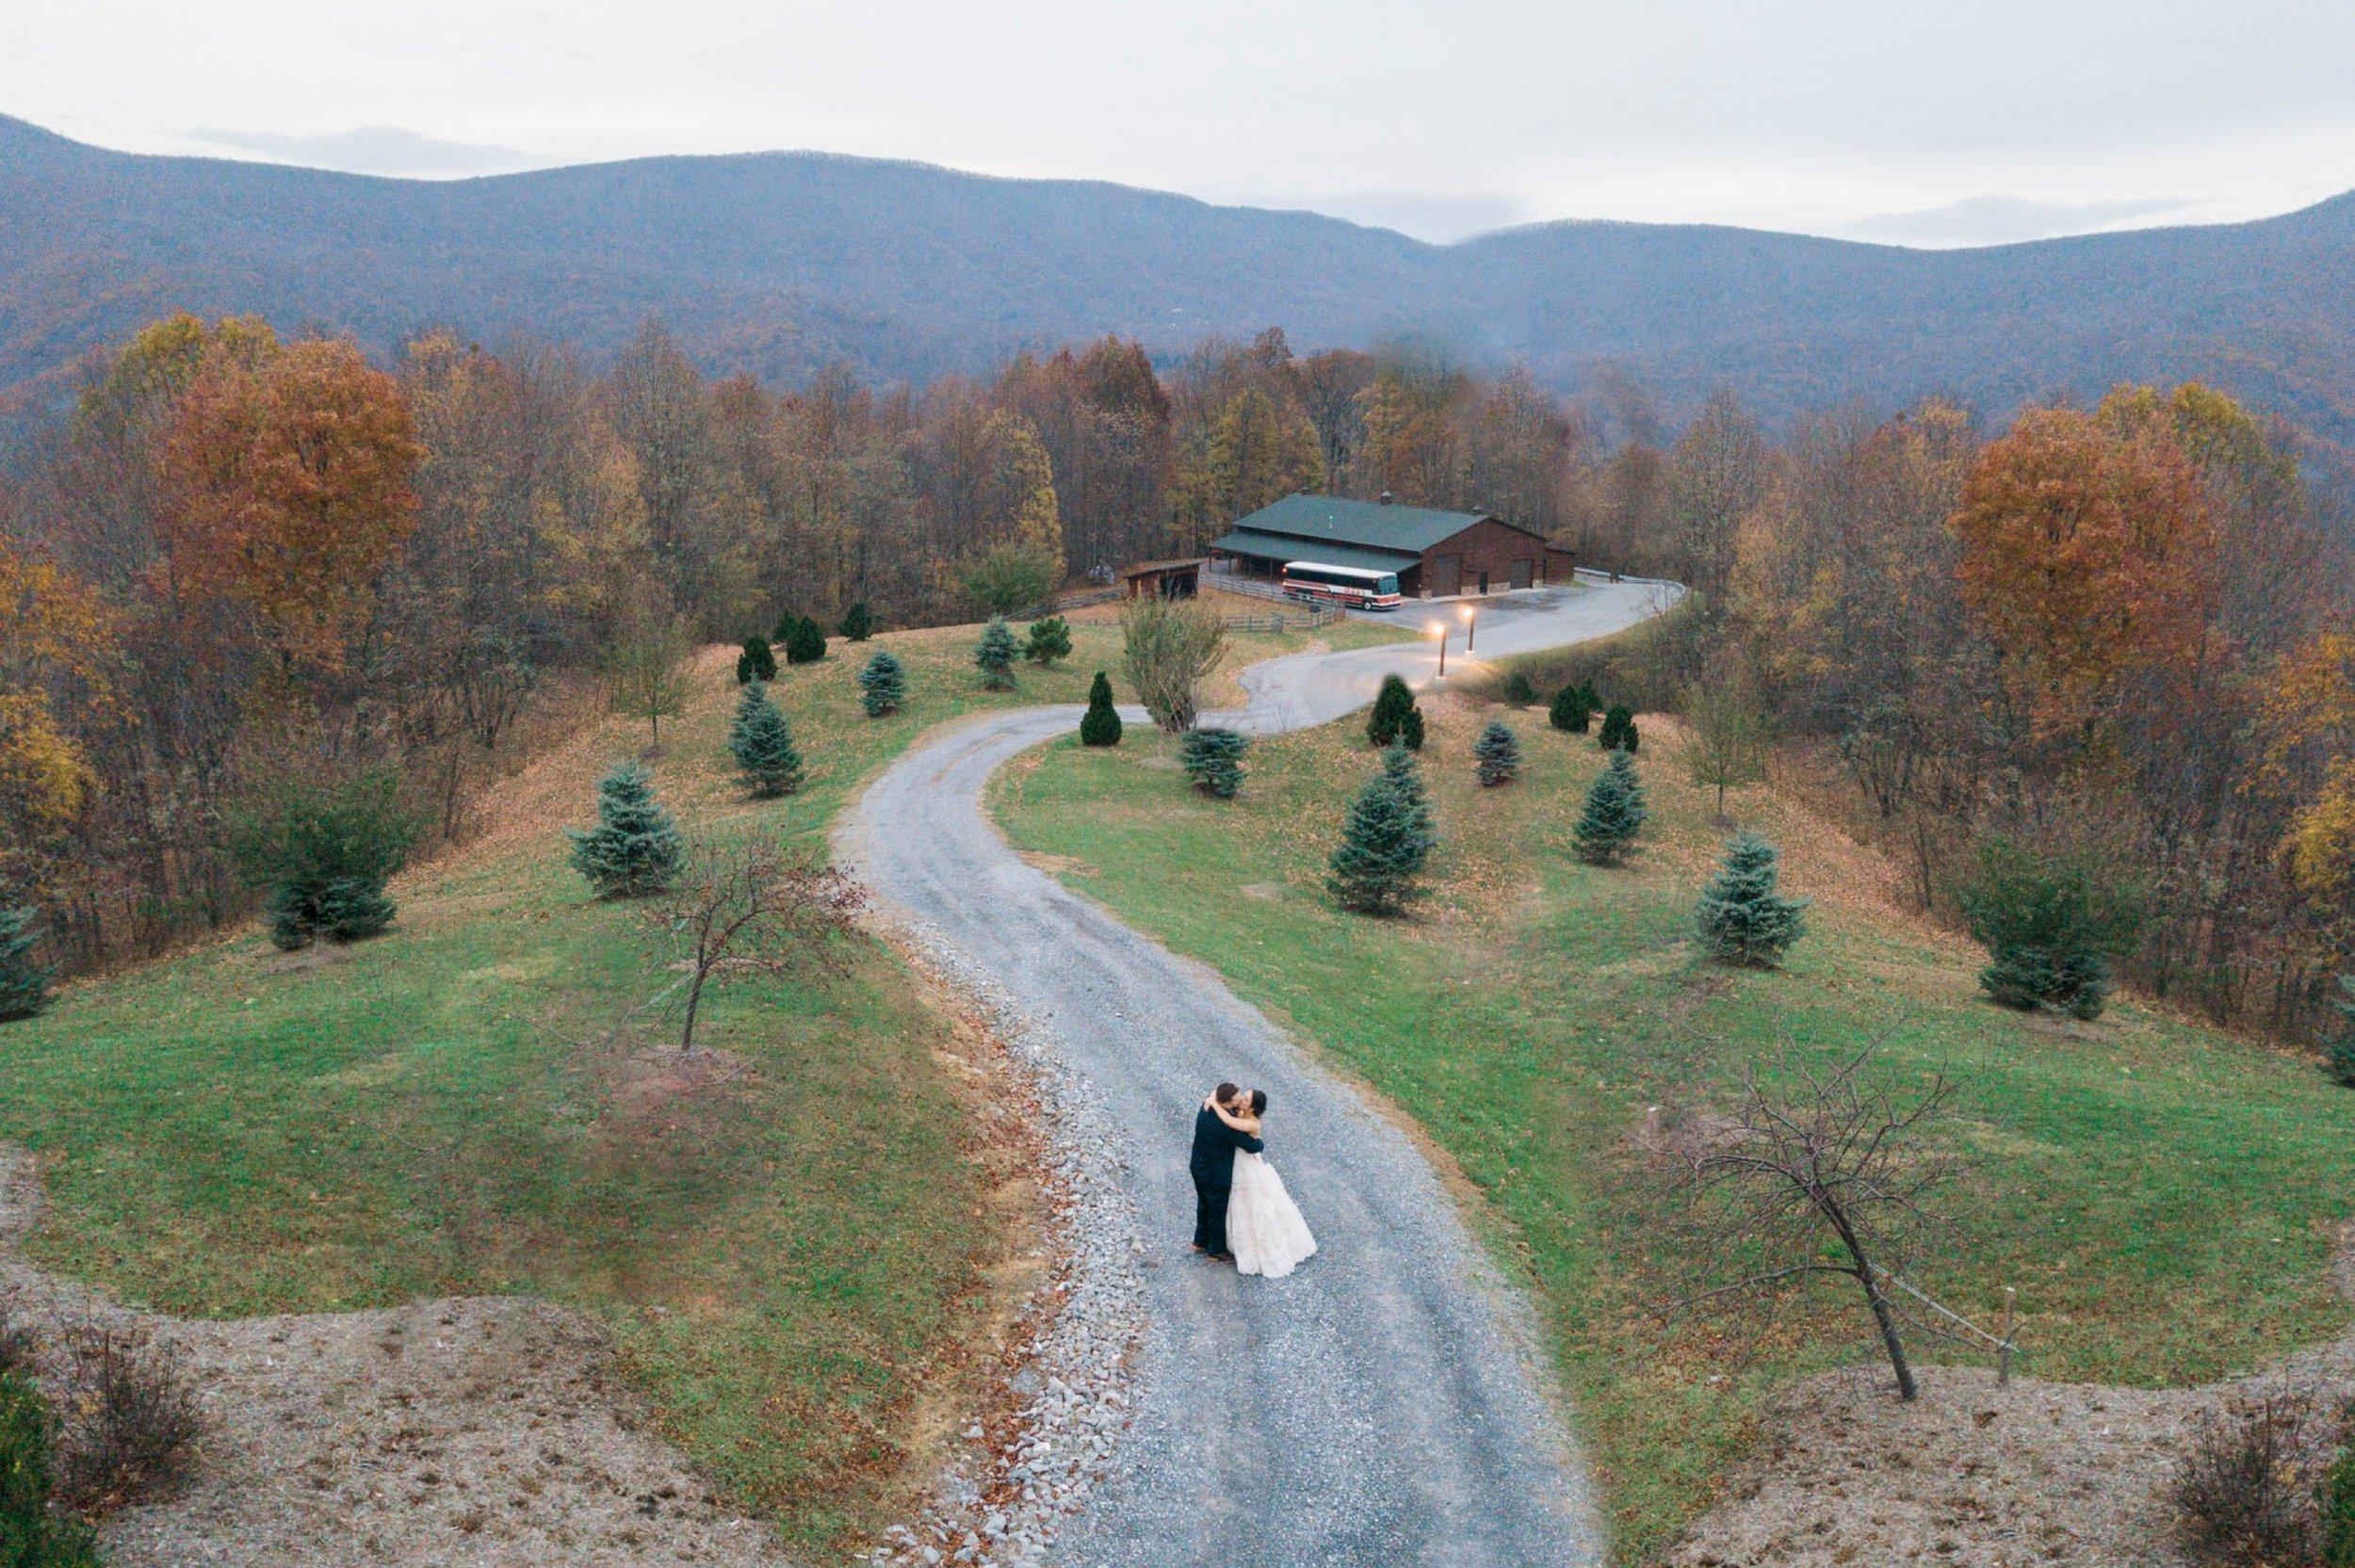 IrvineEstate_LexingtonVA_Wedding_FallWedding_VirginiaWeddingPhotographer 100.jpg